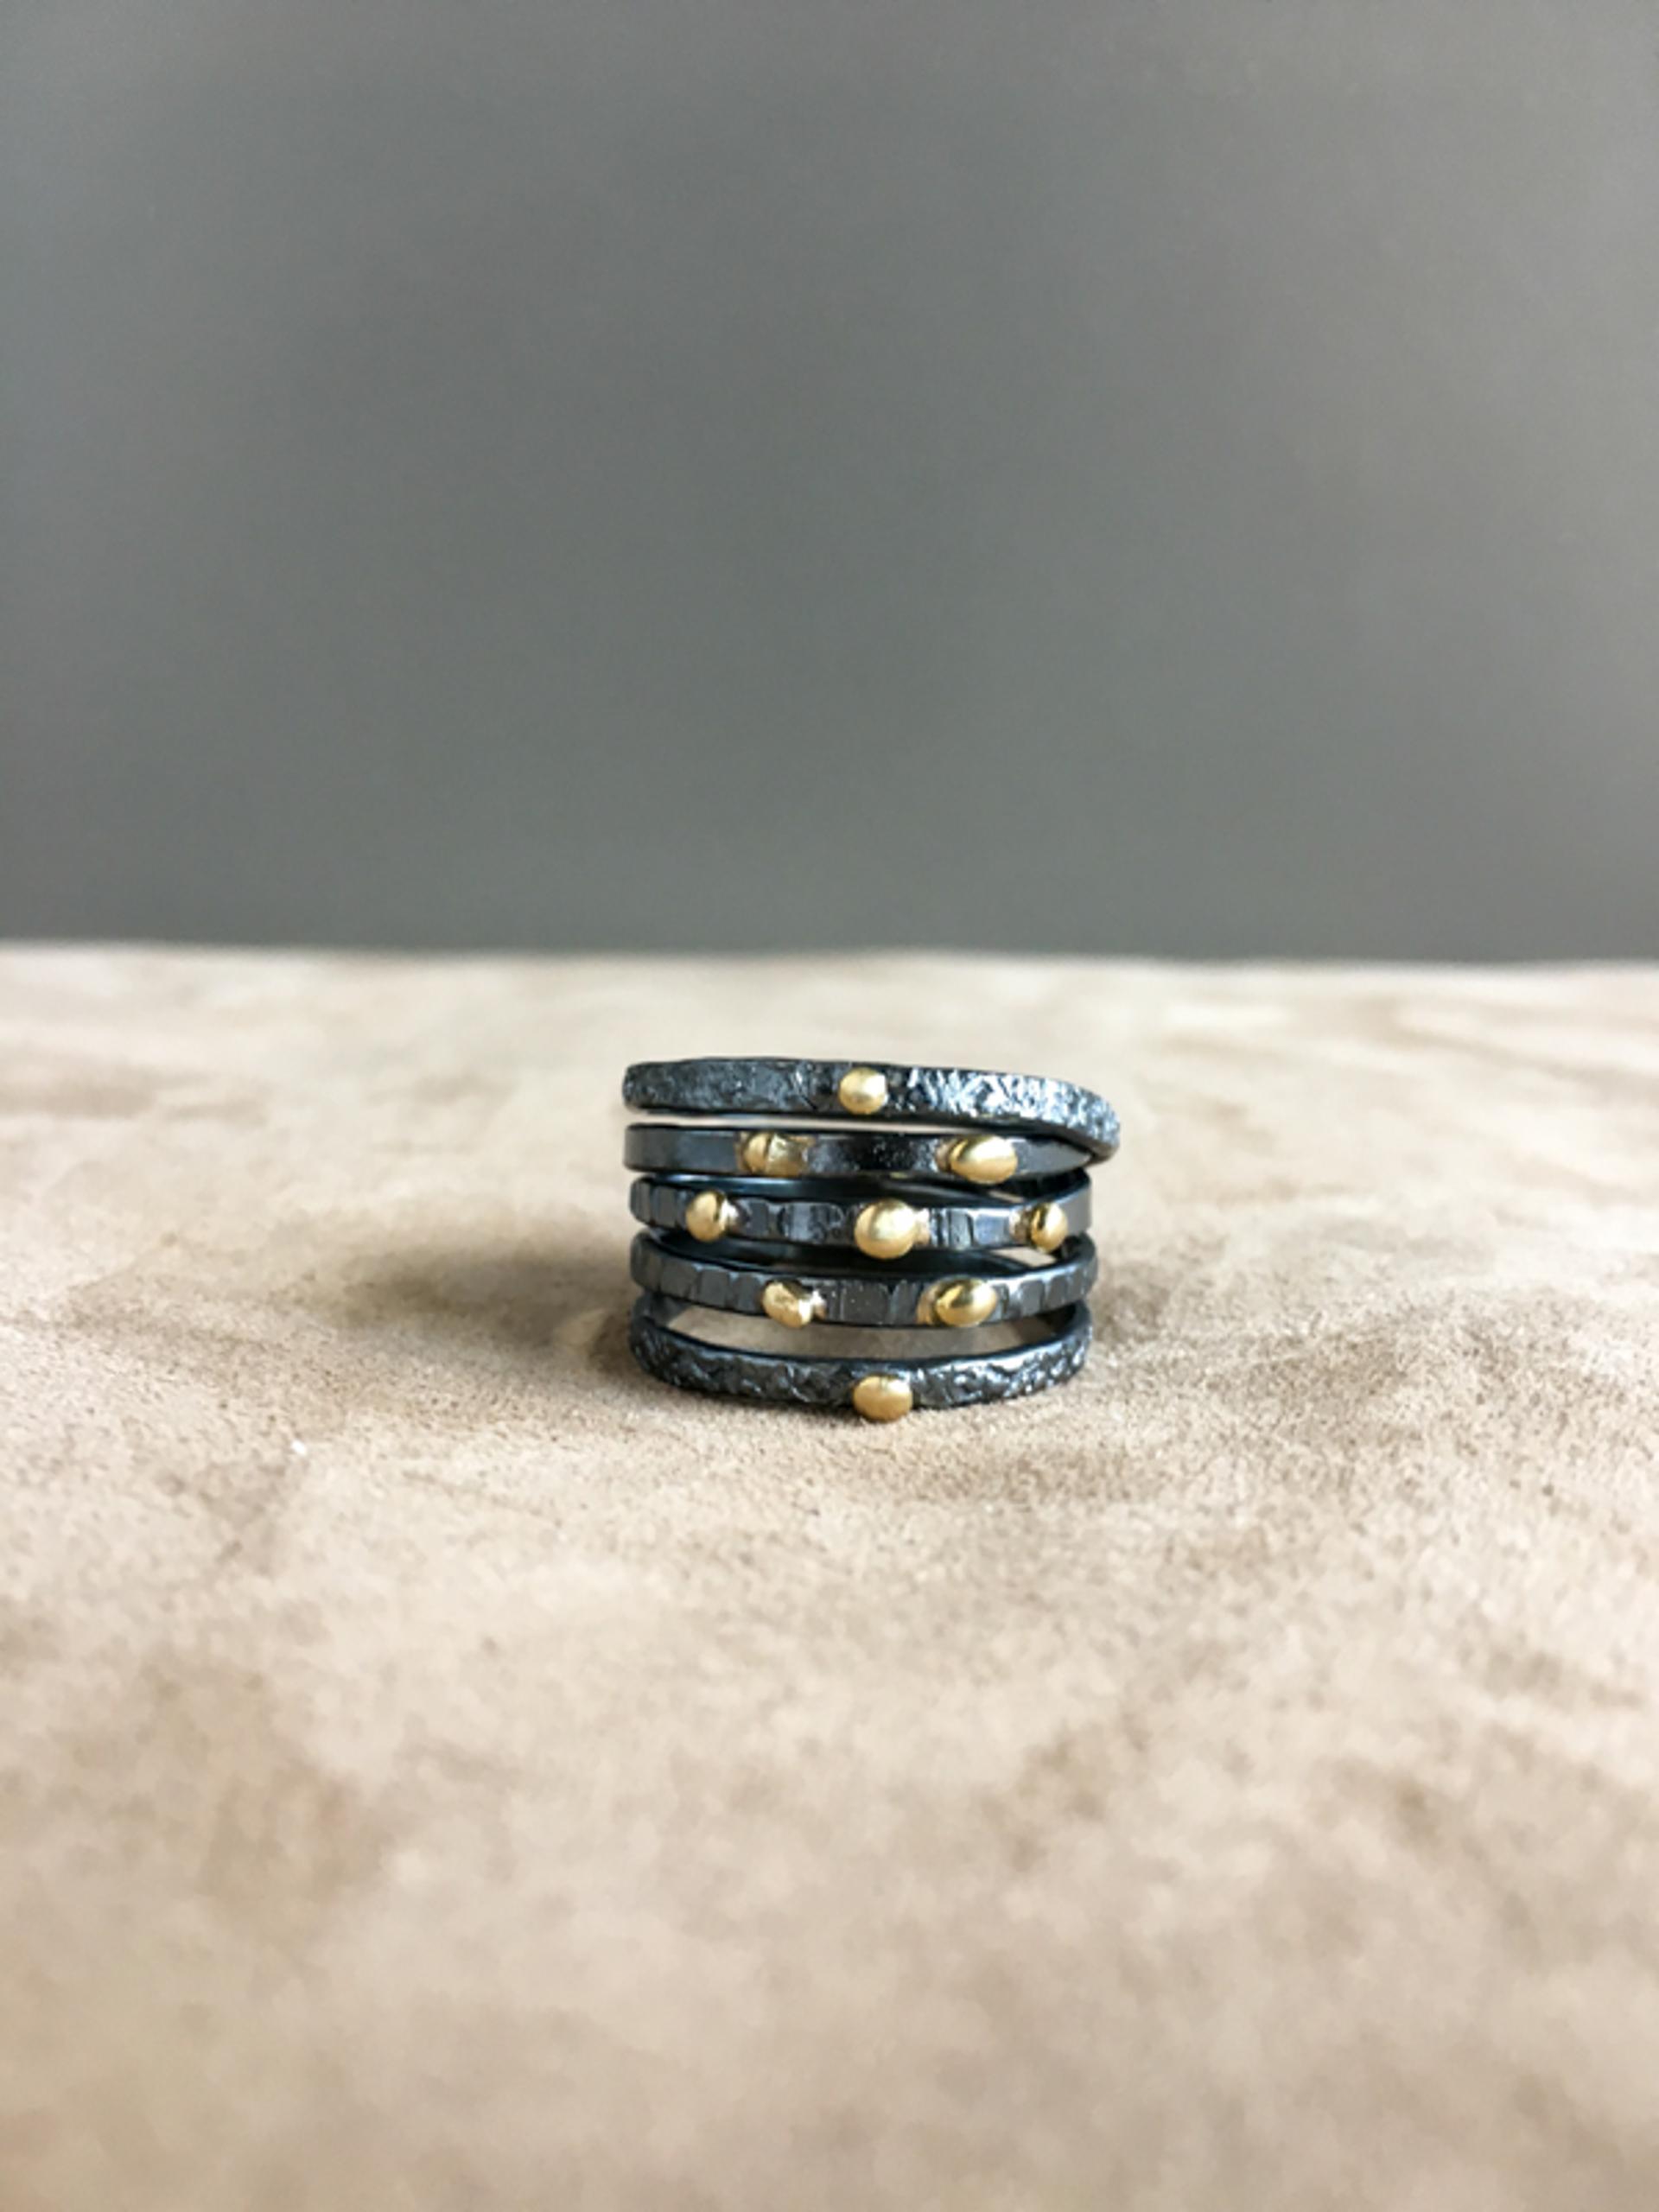 1388-3 Ring by Donna Burdic